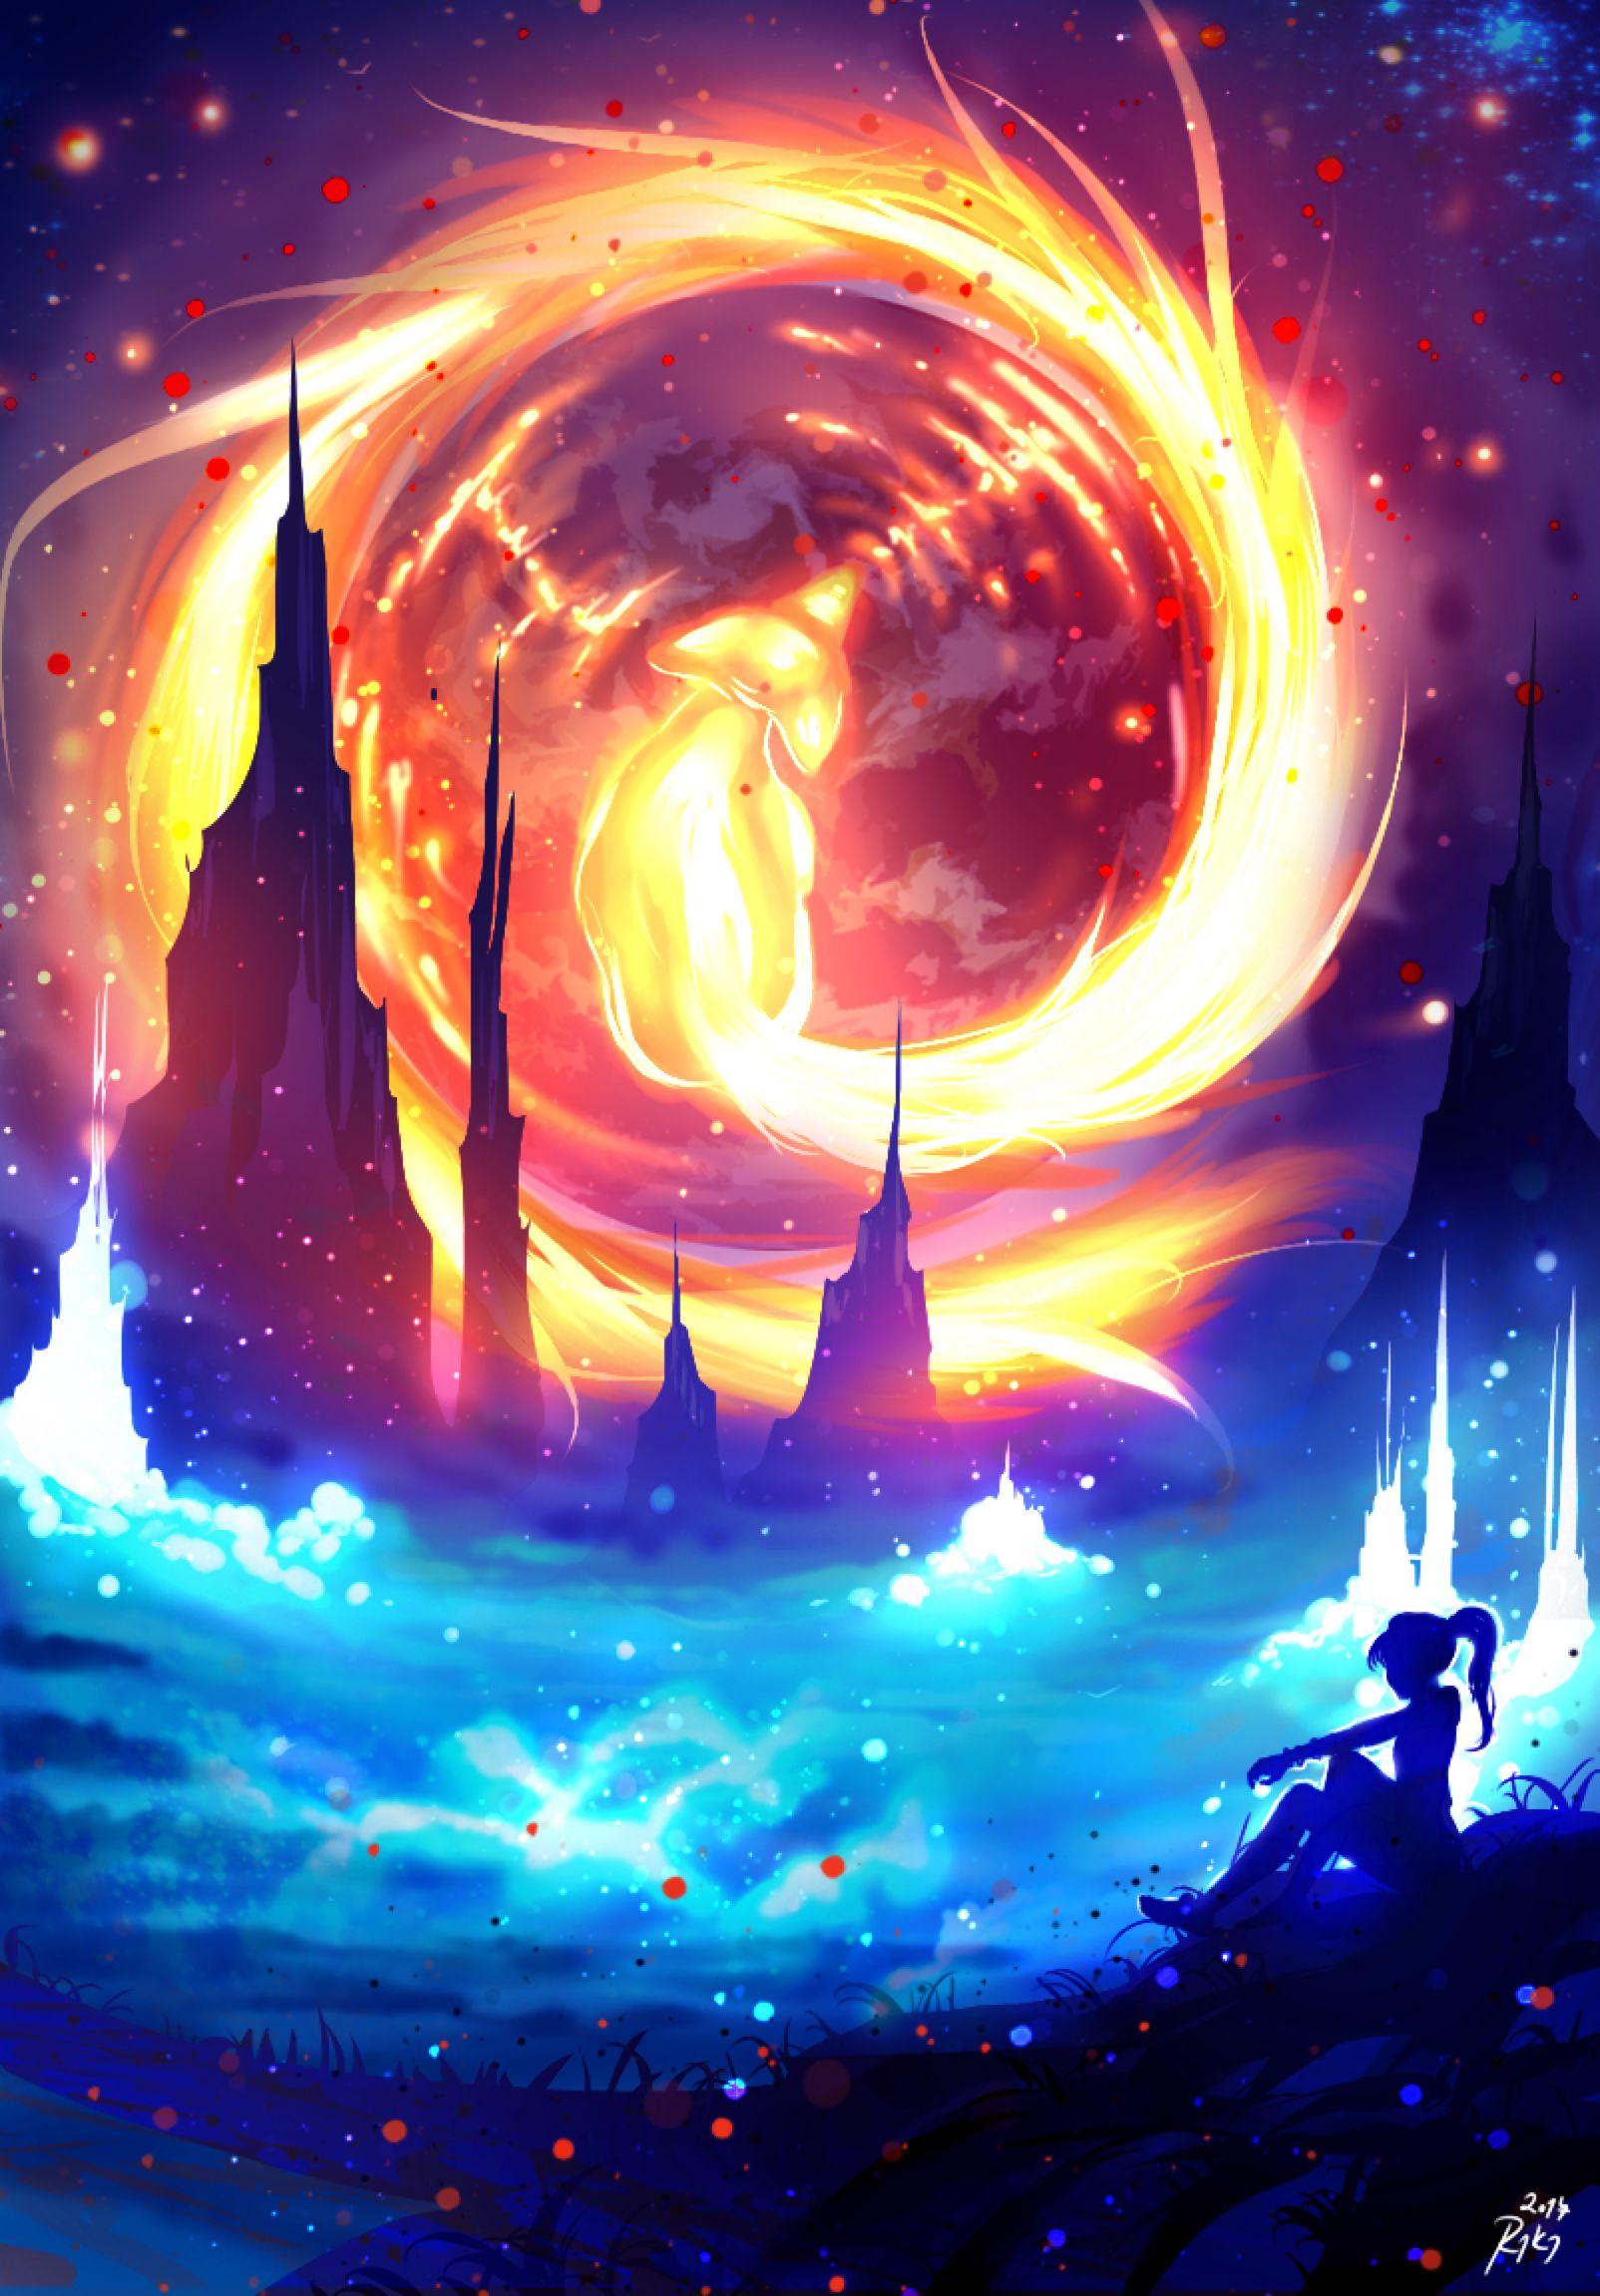 World Of Firefox By Ryky On Deviantart Anime Wallpaper Anime Scenery Art Wallpaper